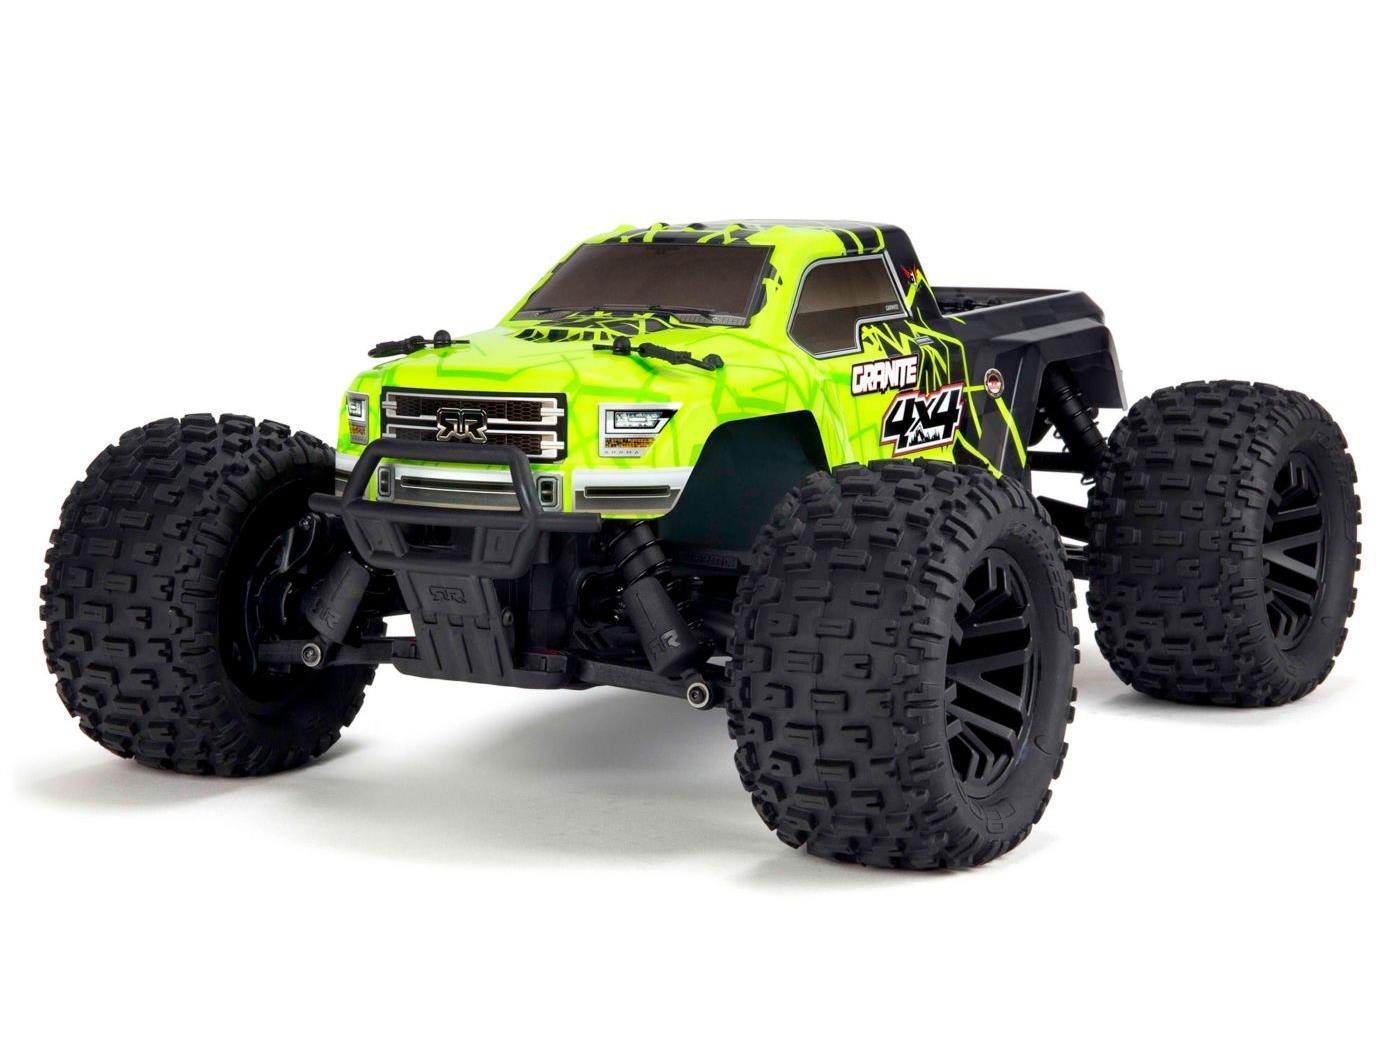 Arrma 1/10 Granite Mega 4x4 Brushed 4WD MT Green/Black RTR